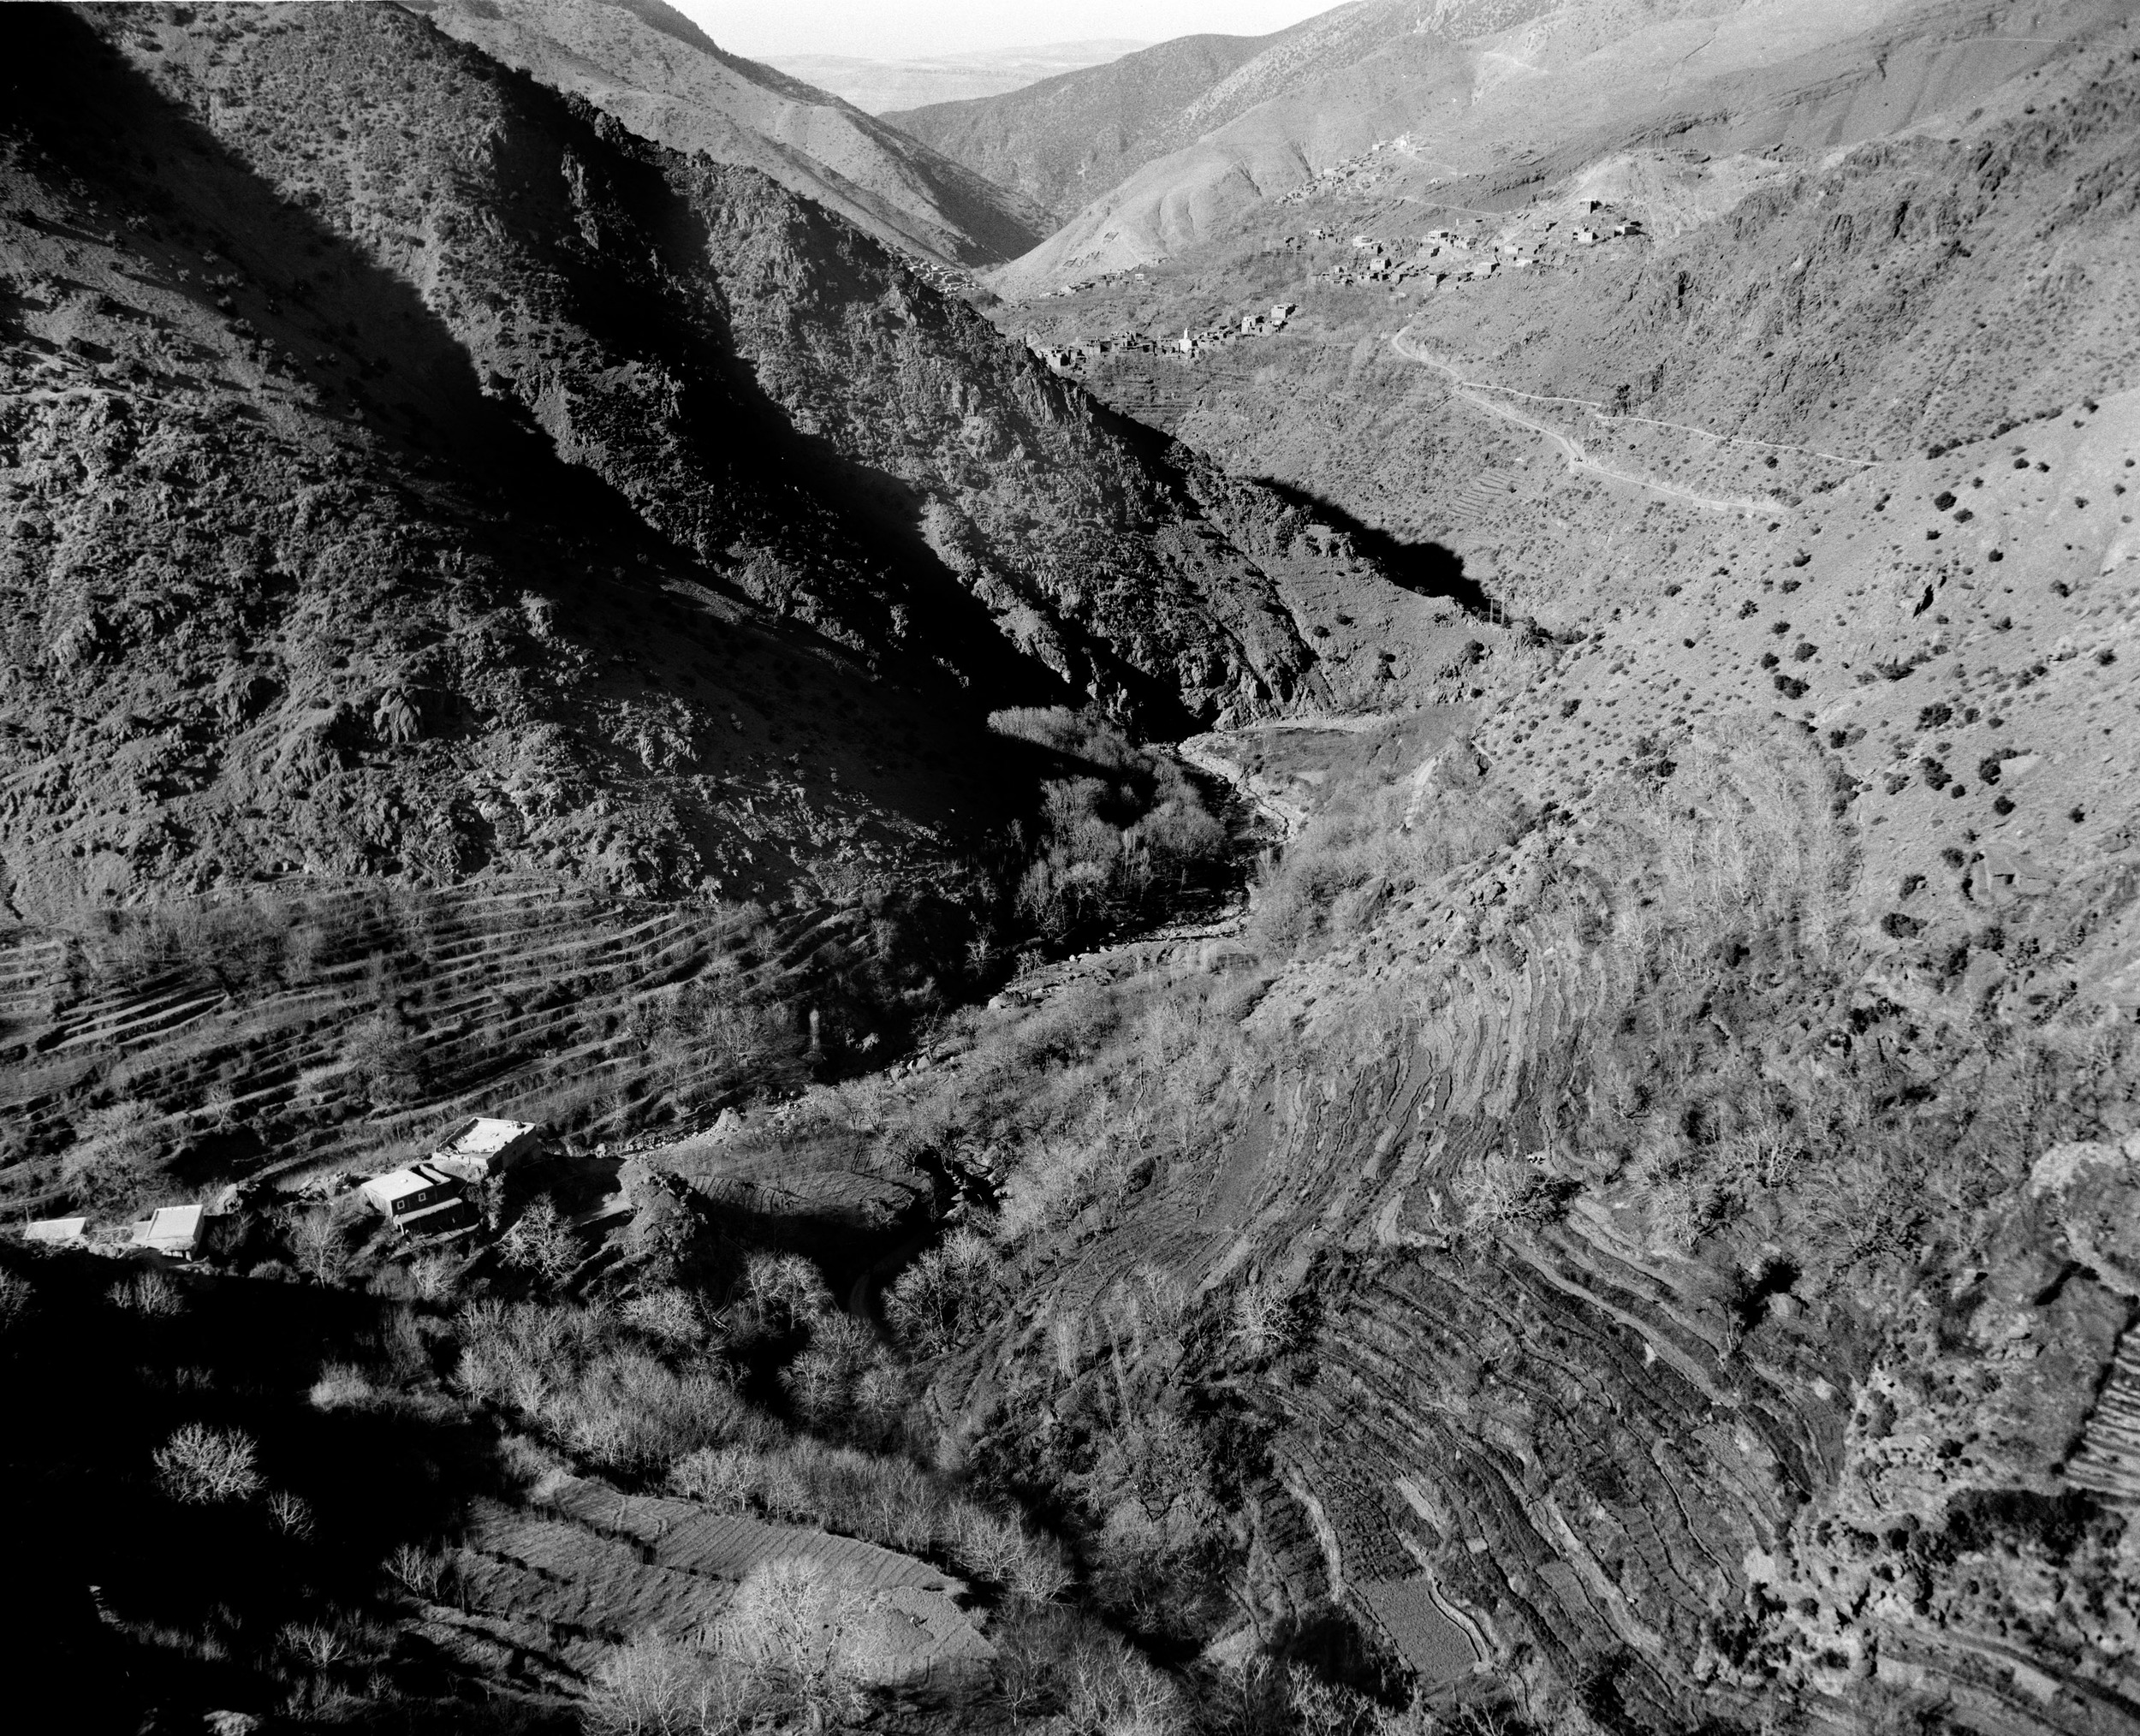 Lower Atlas Mountains